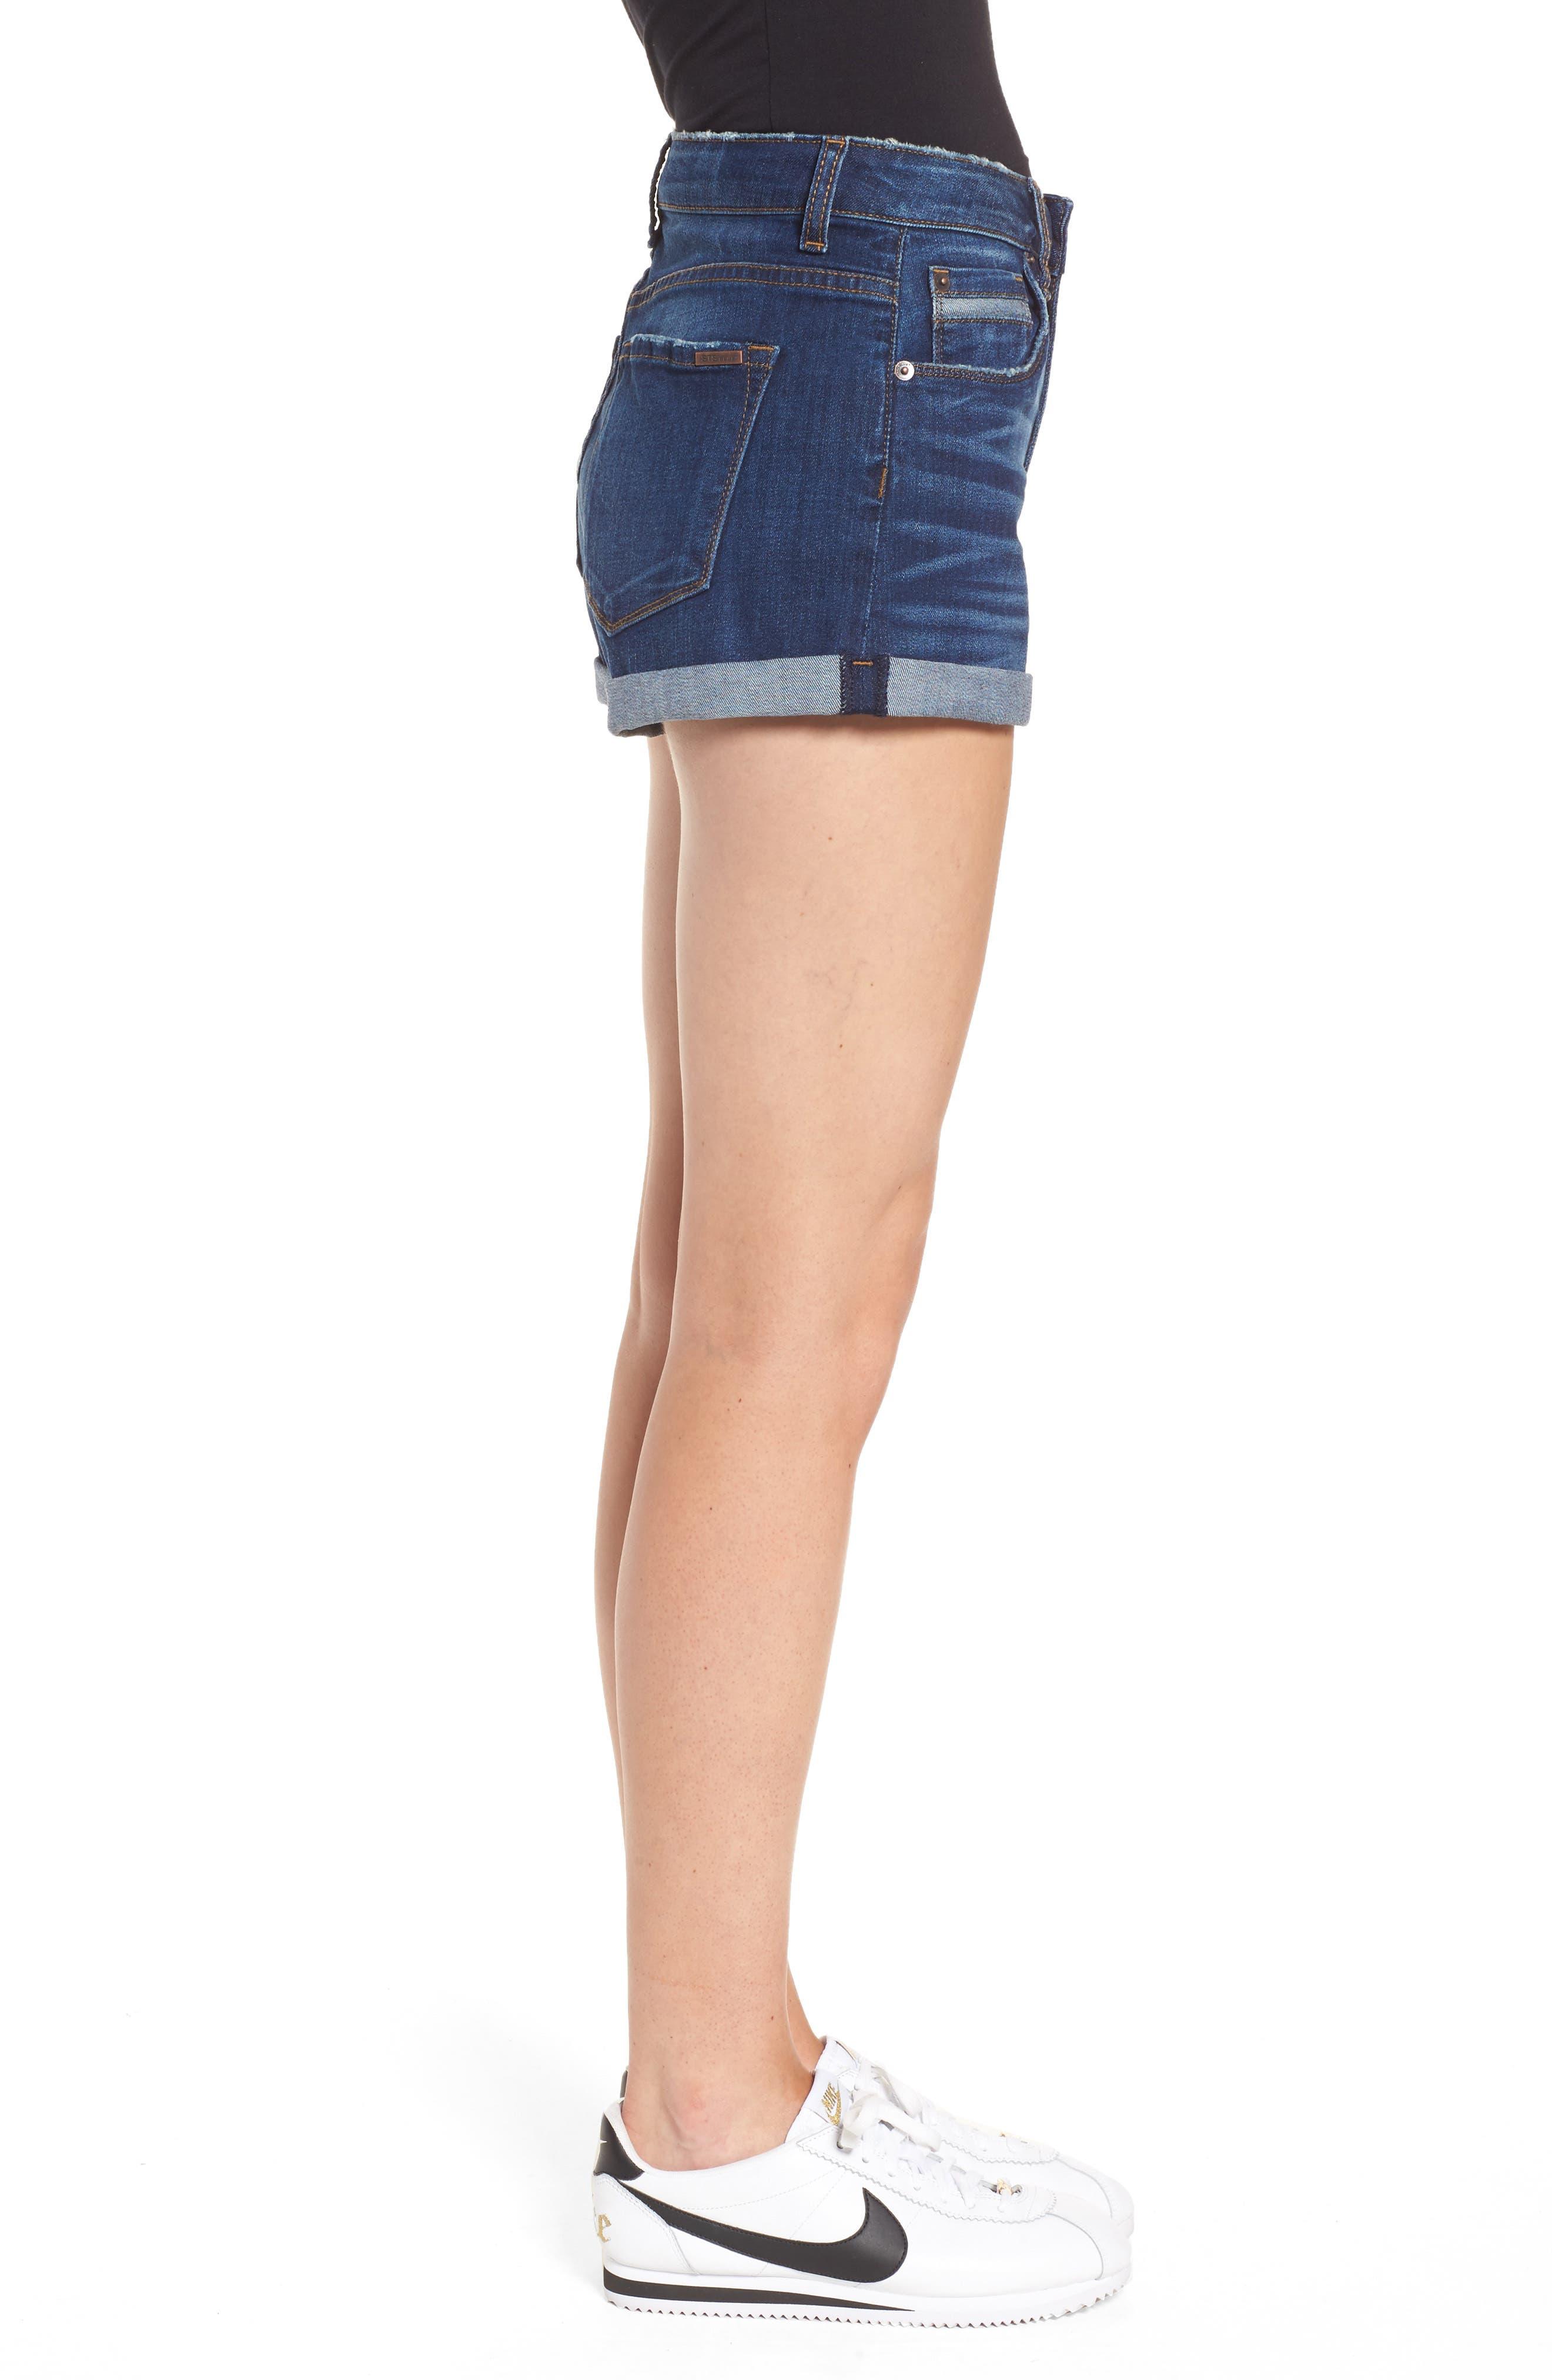 Rose Bowl Cuffed Denim Shorts,                             Alternate thumbnail 3, color,                             Sageland